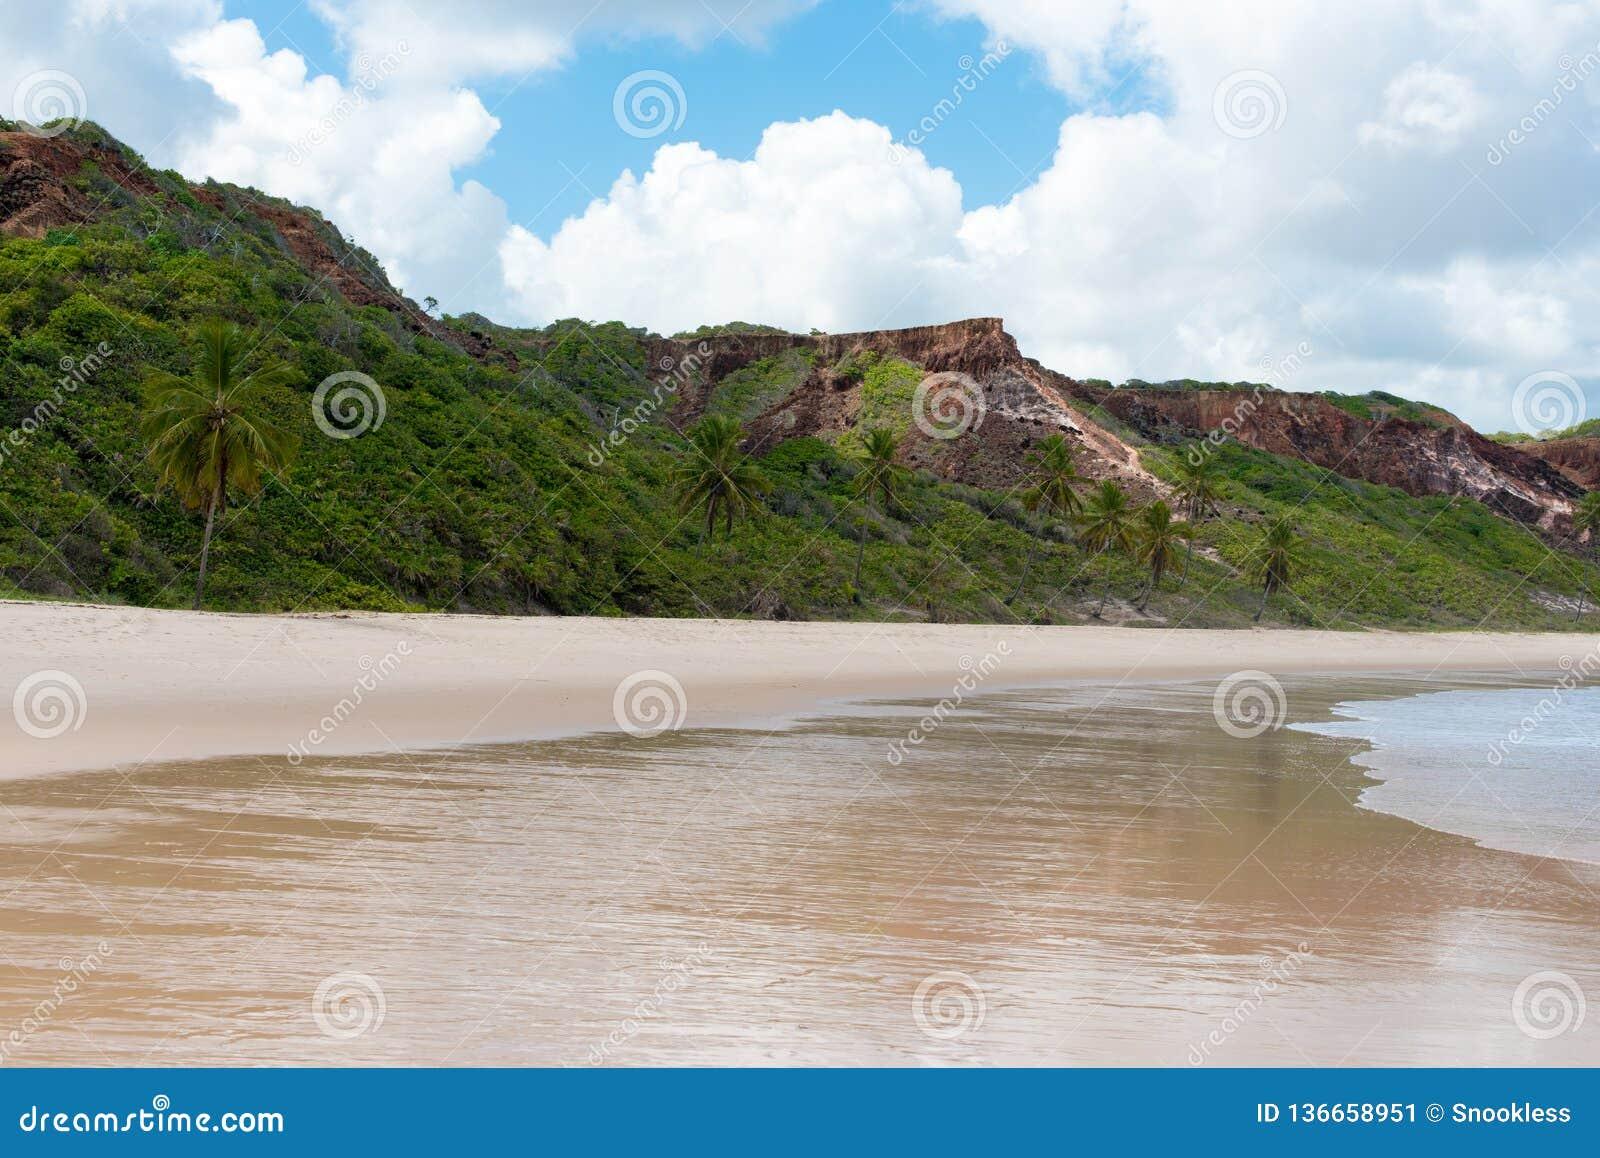 Litoral brasileiro montanhoso